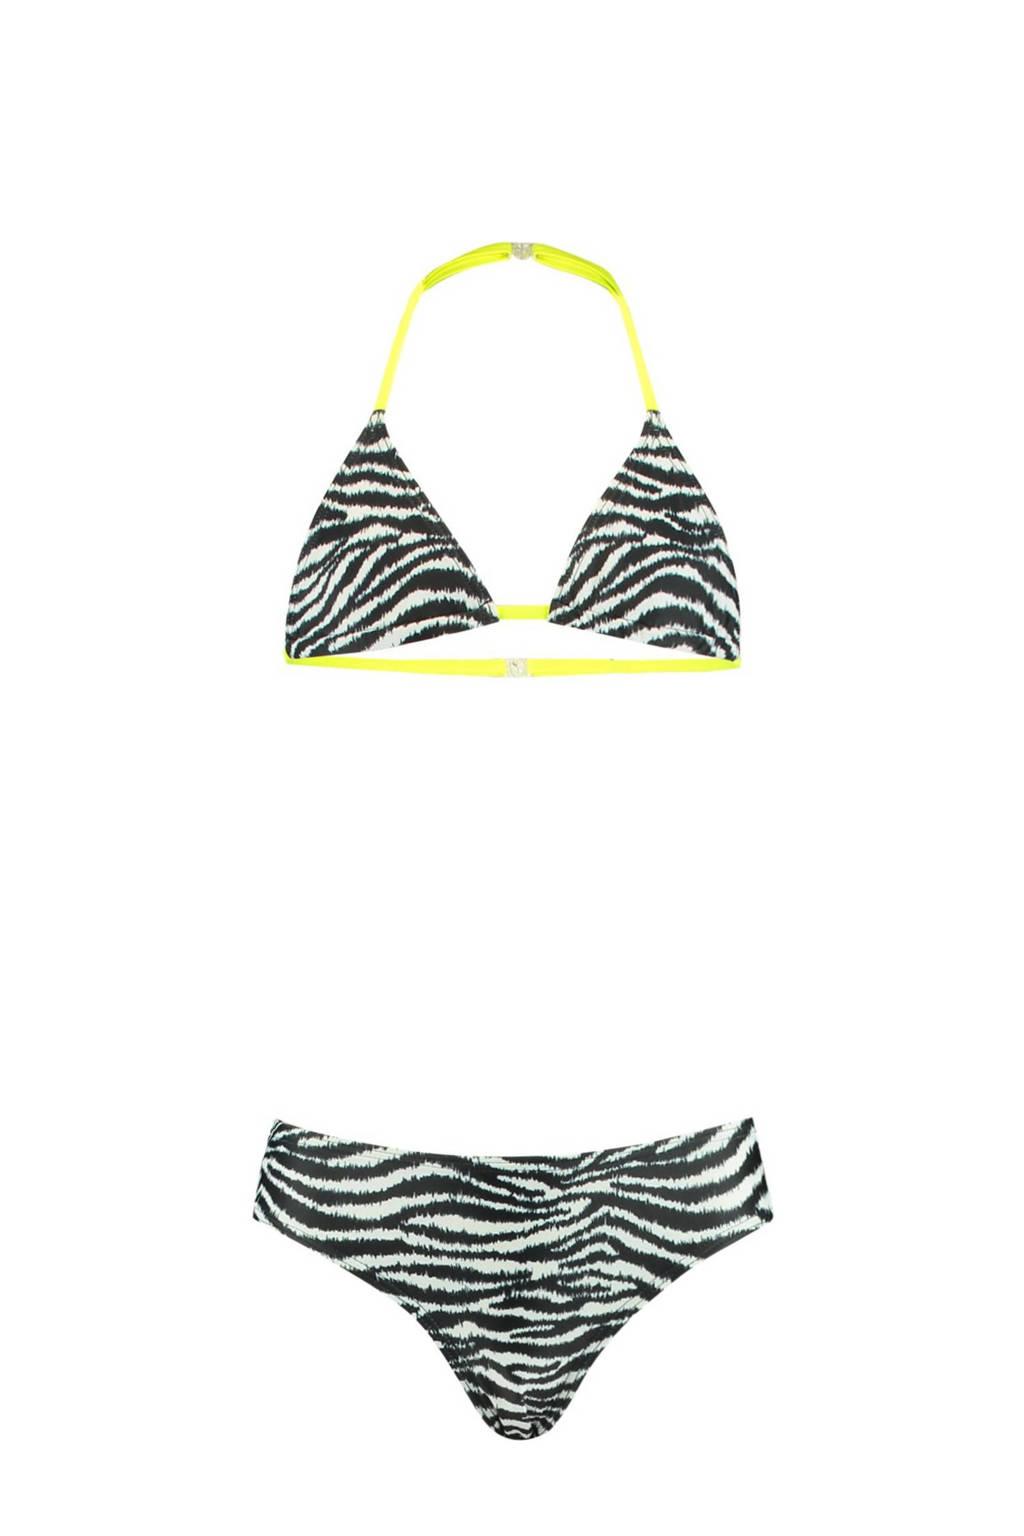 CoolCat Junior triangel bikini Yoella met zebraprint zwart/wit, Zwart/wit